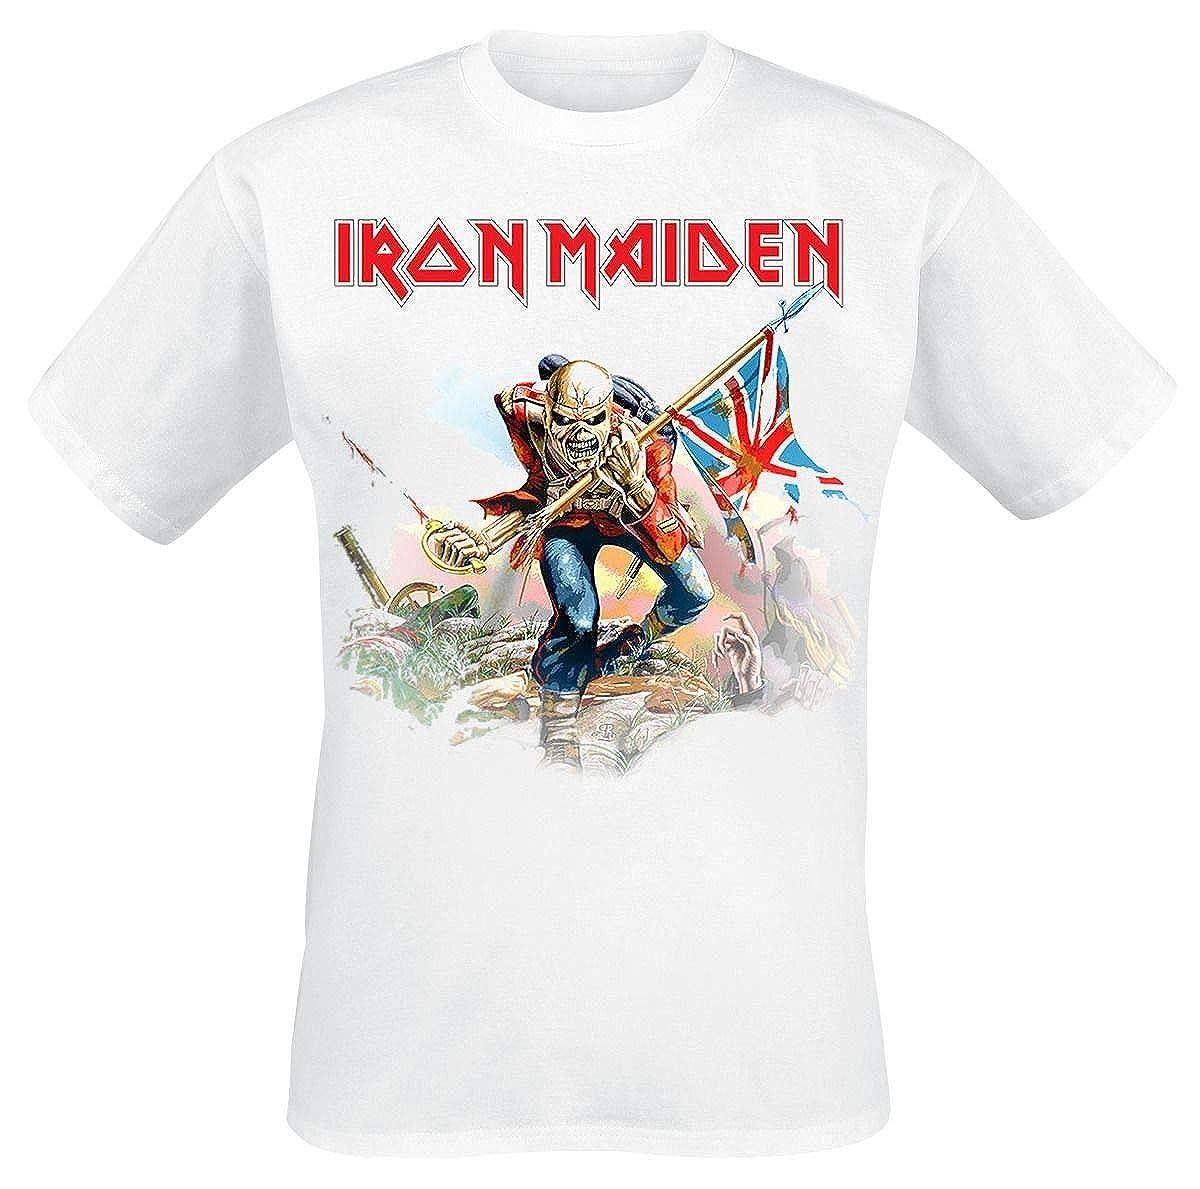 Iron Maiden Trooper On White T-Shirt White: Amazon.co.uk: Clothing